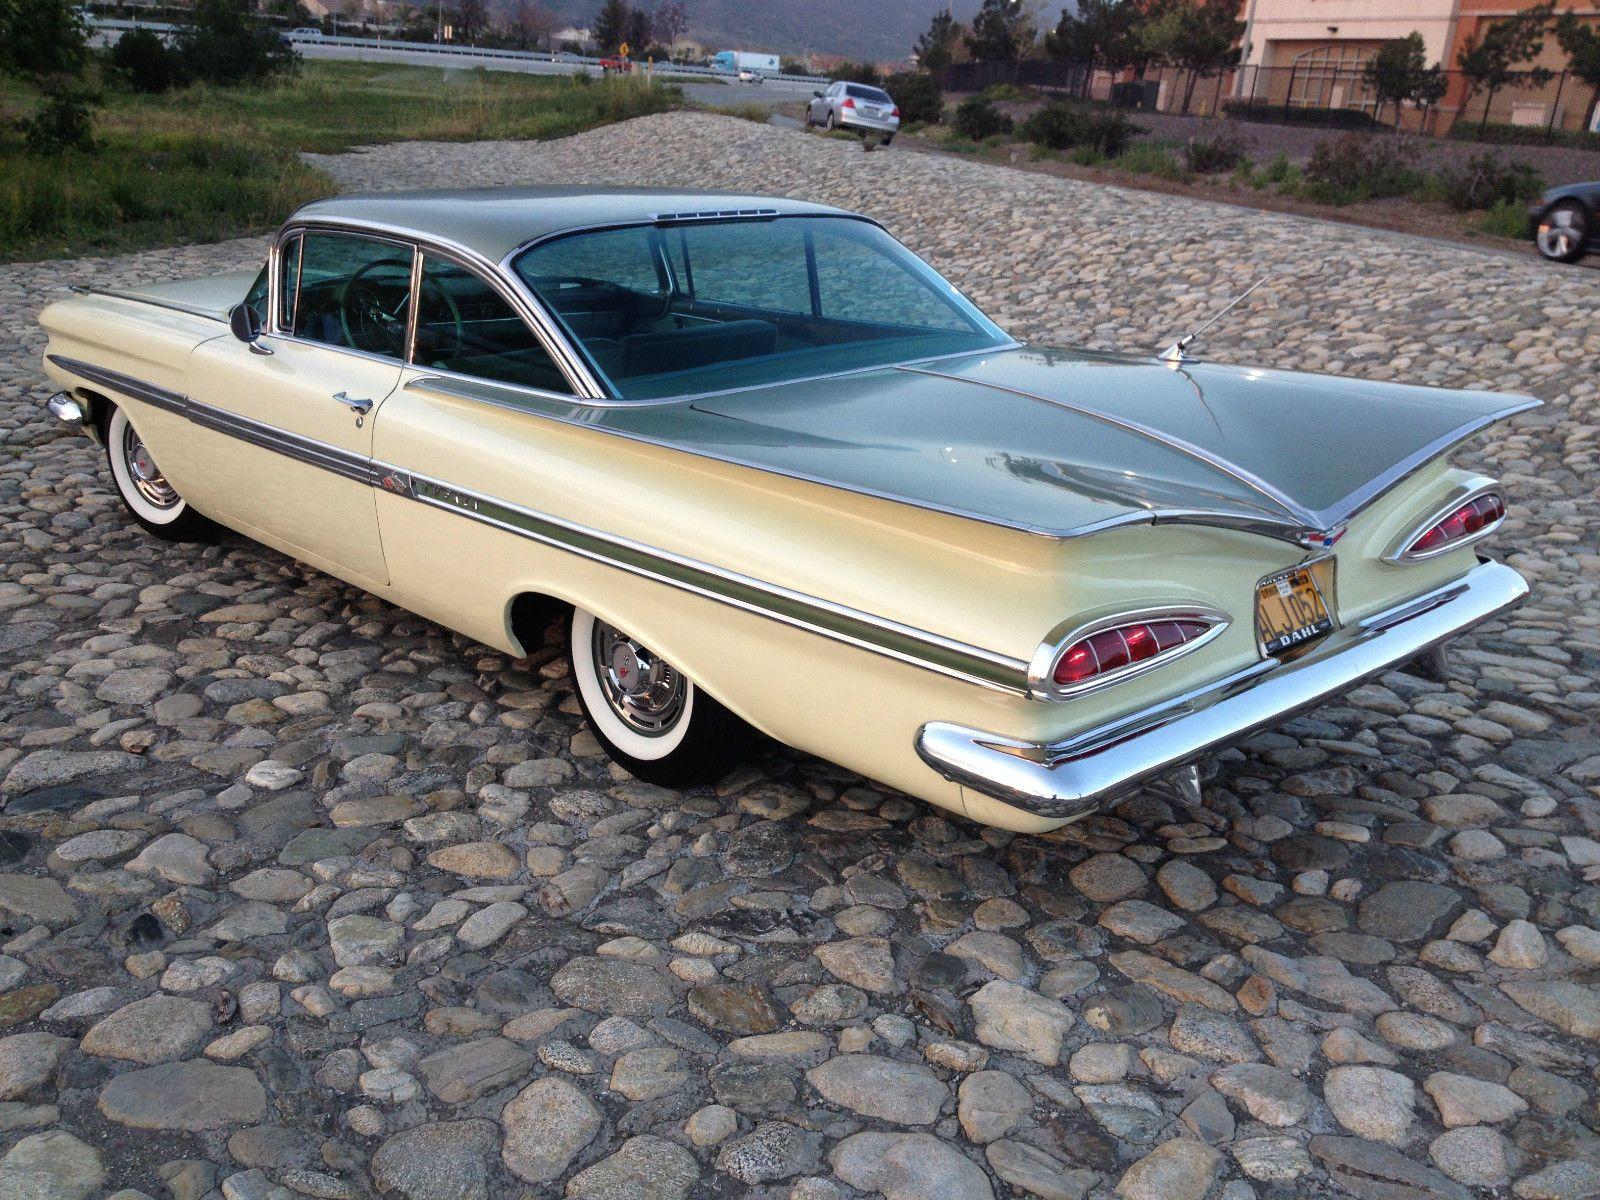 1959 Chevrolet Impala Chevrolet Impala Chevrolet Classic Cars